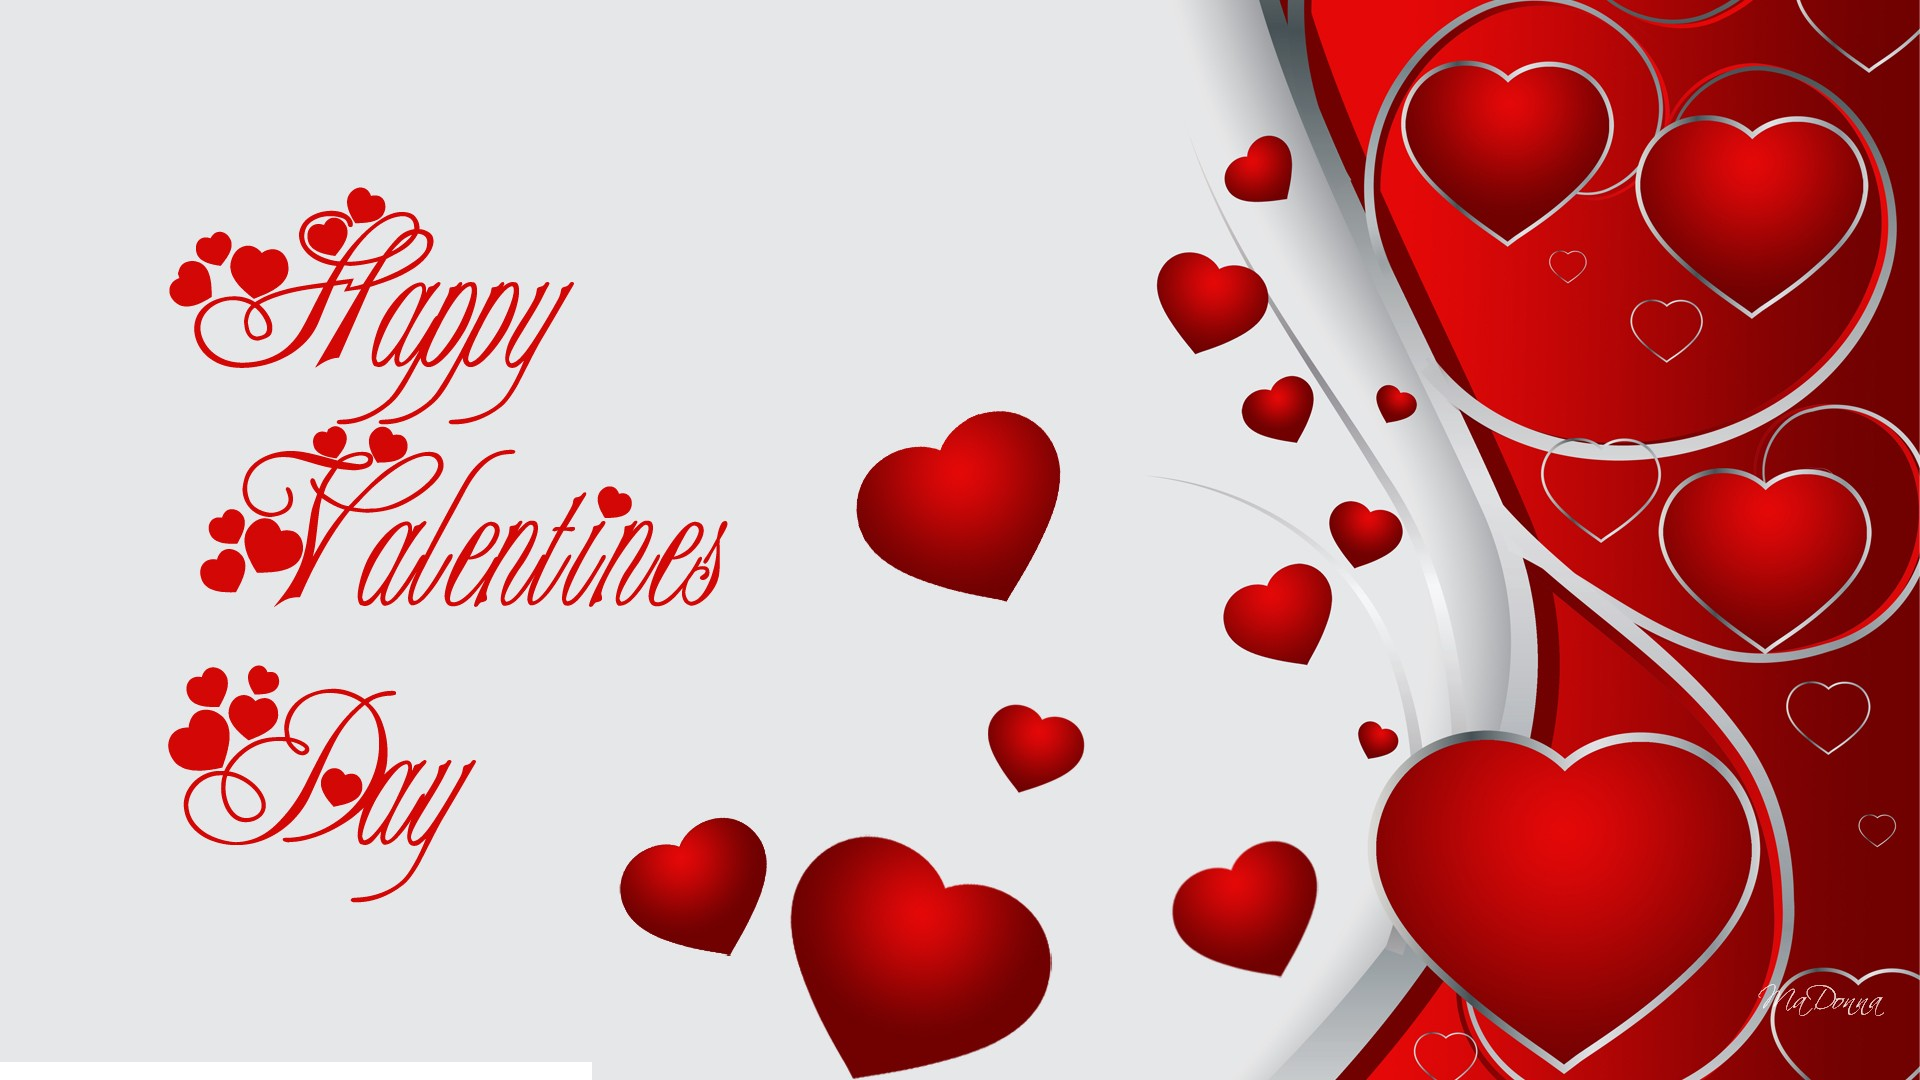 day desktop wallpapers valentines - photo #29